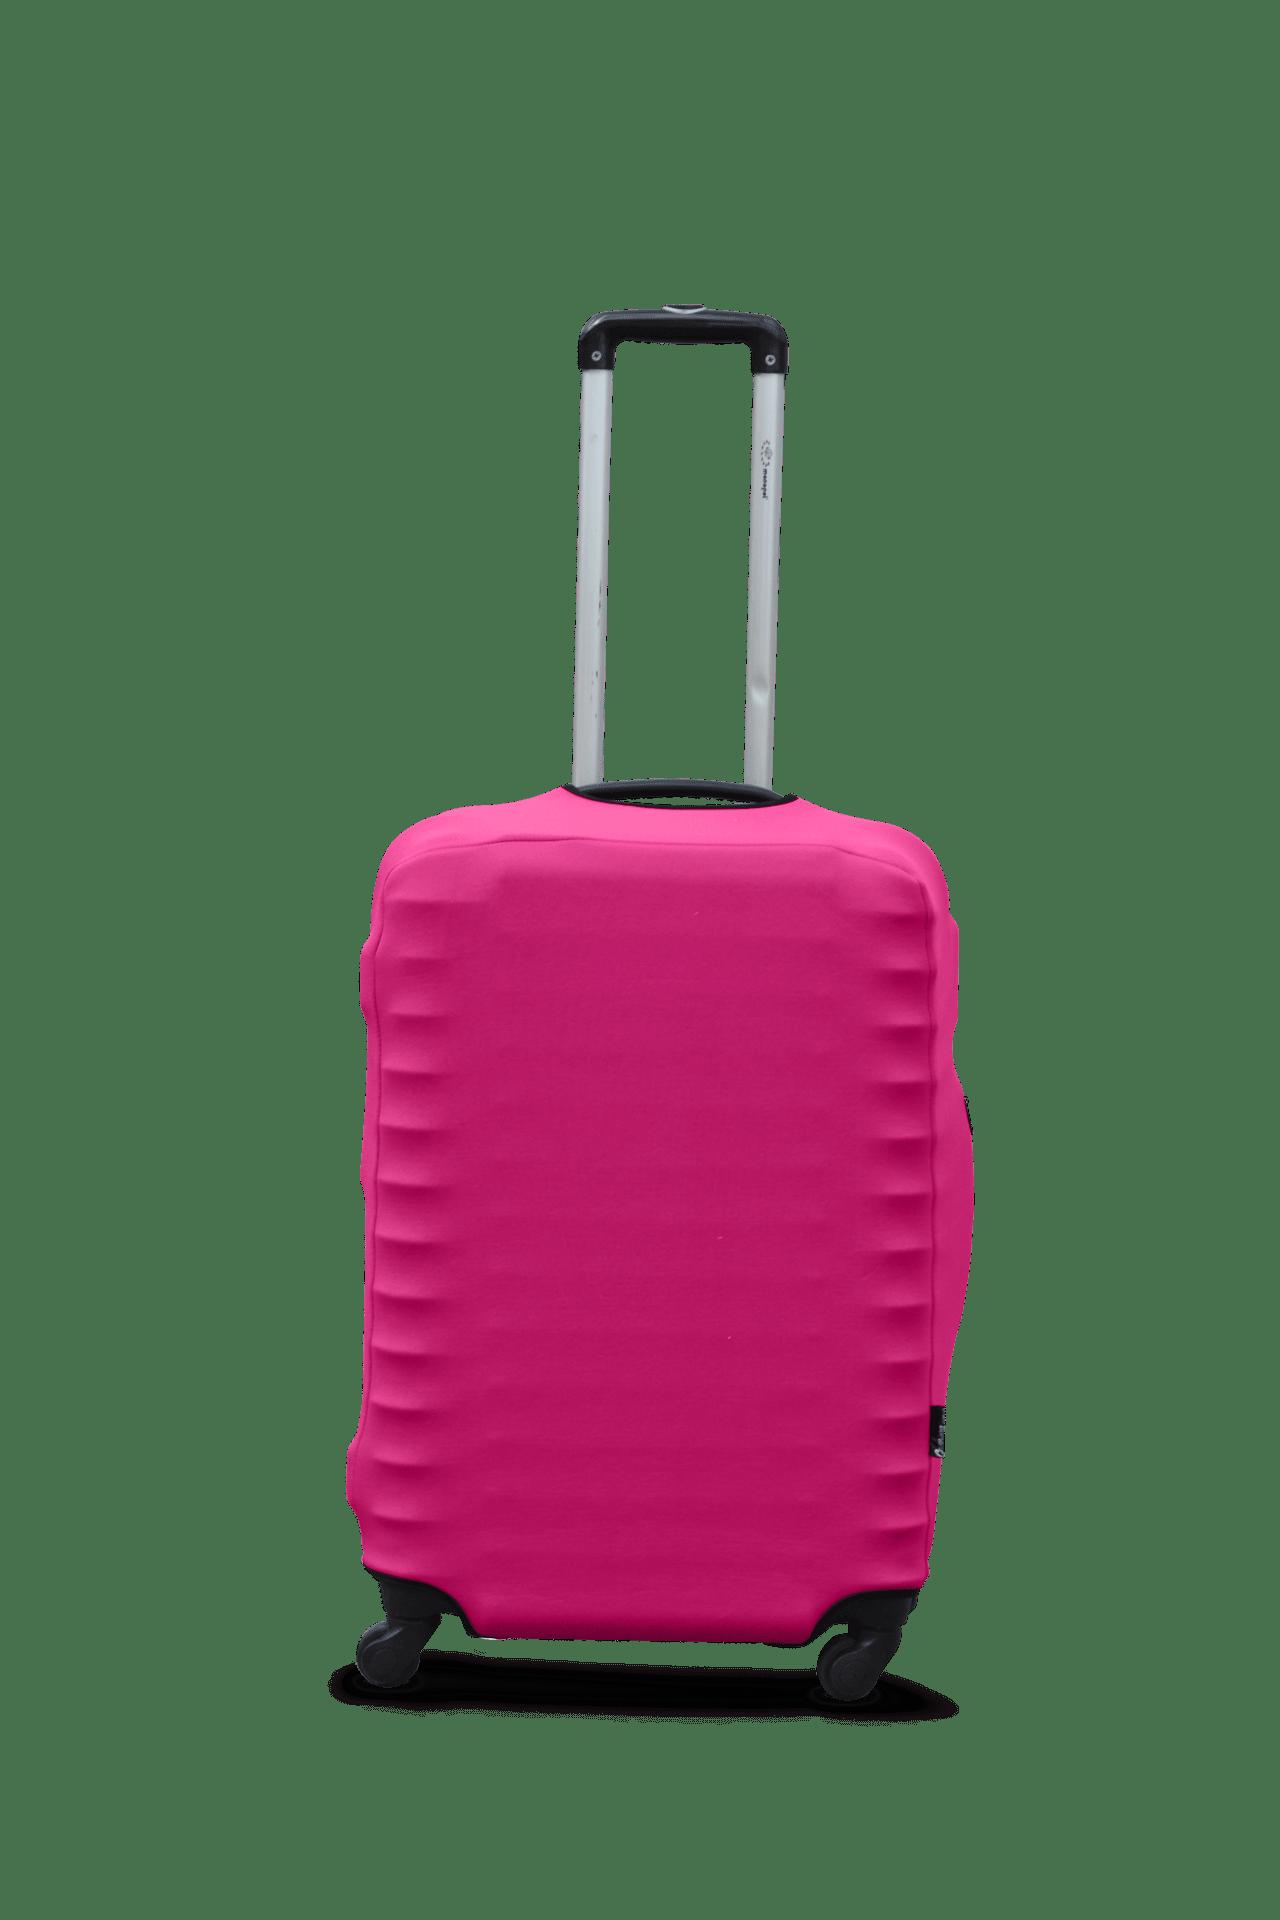 Husa pentru valiza daiving Cover DAWING S PINK